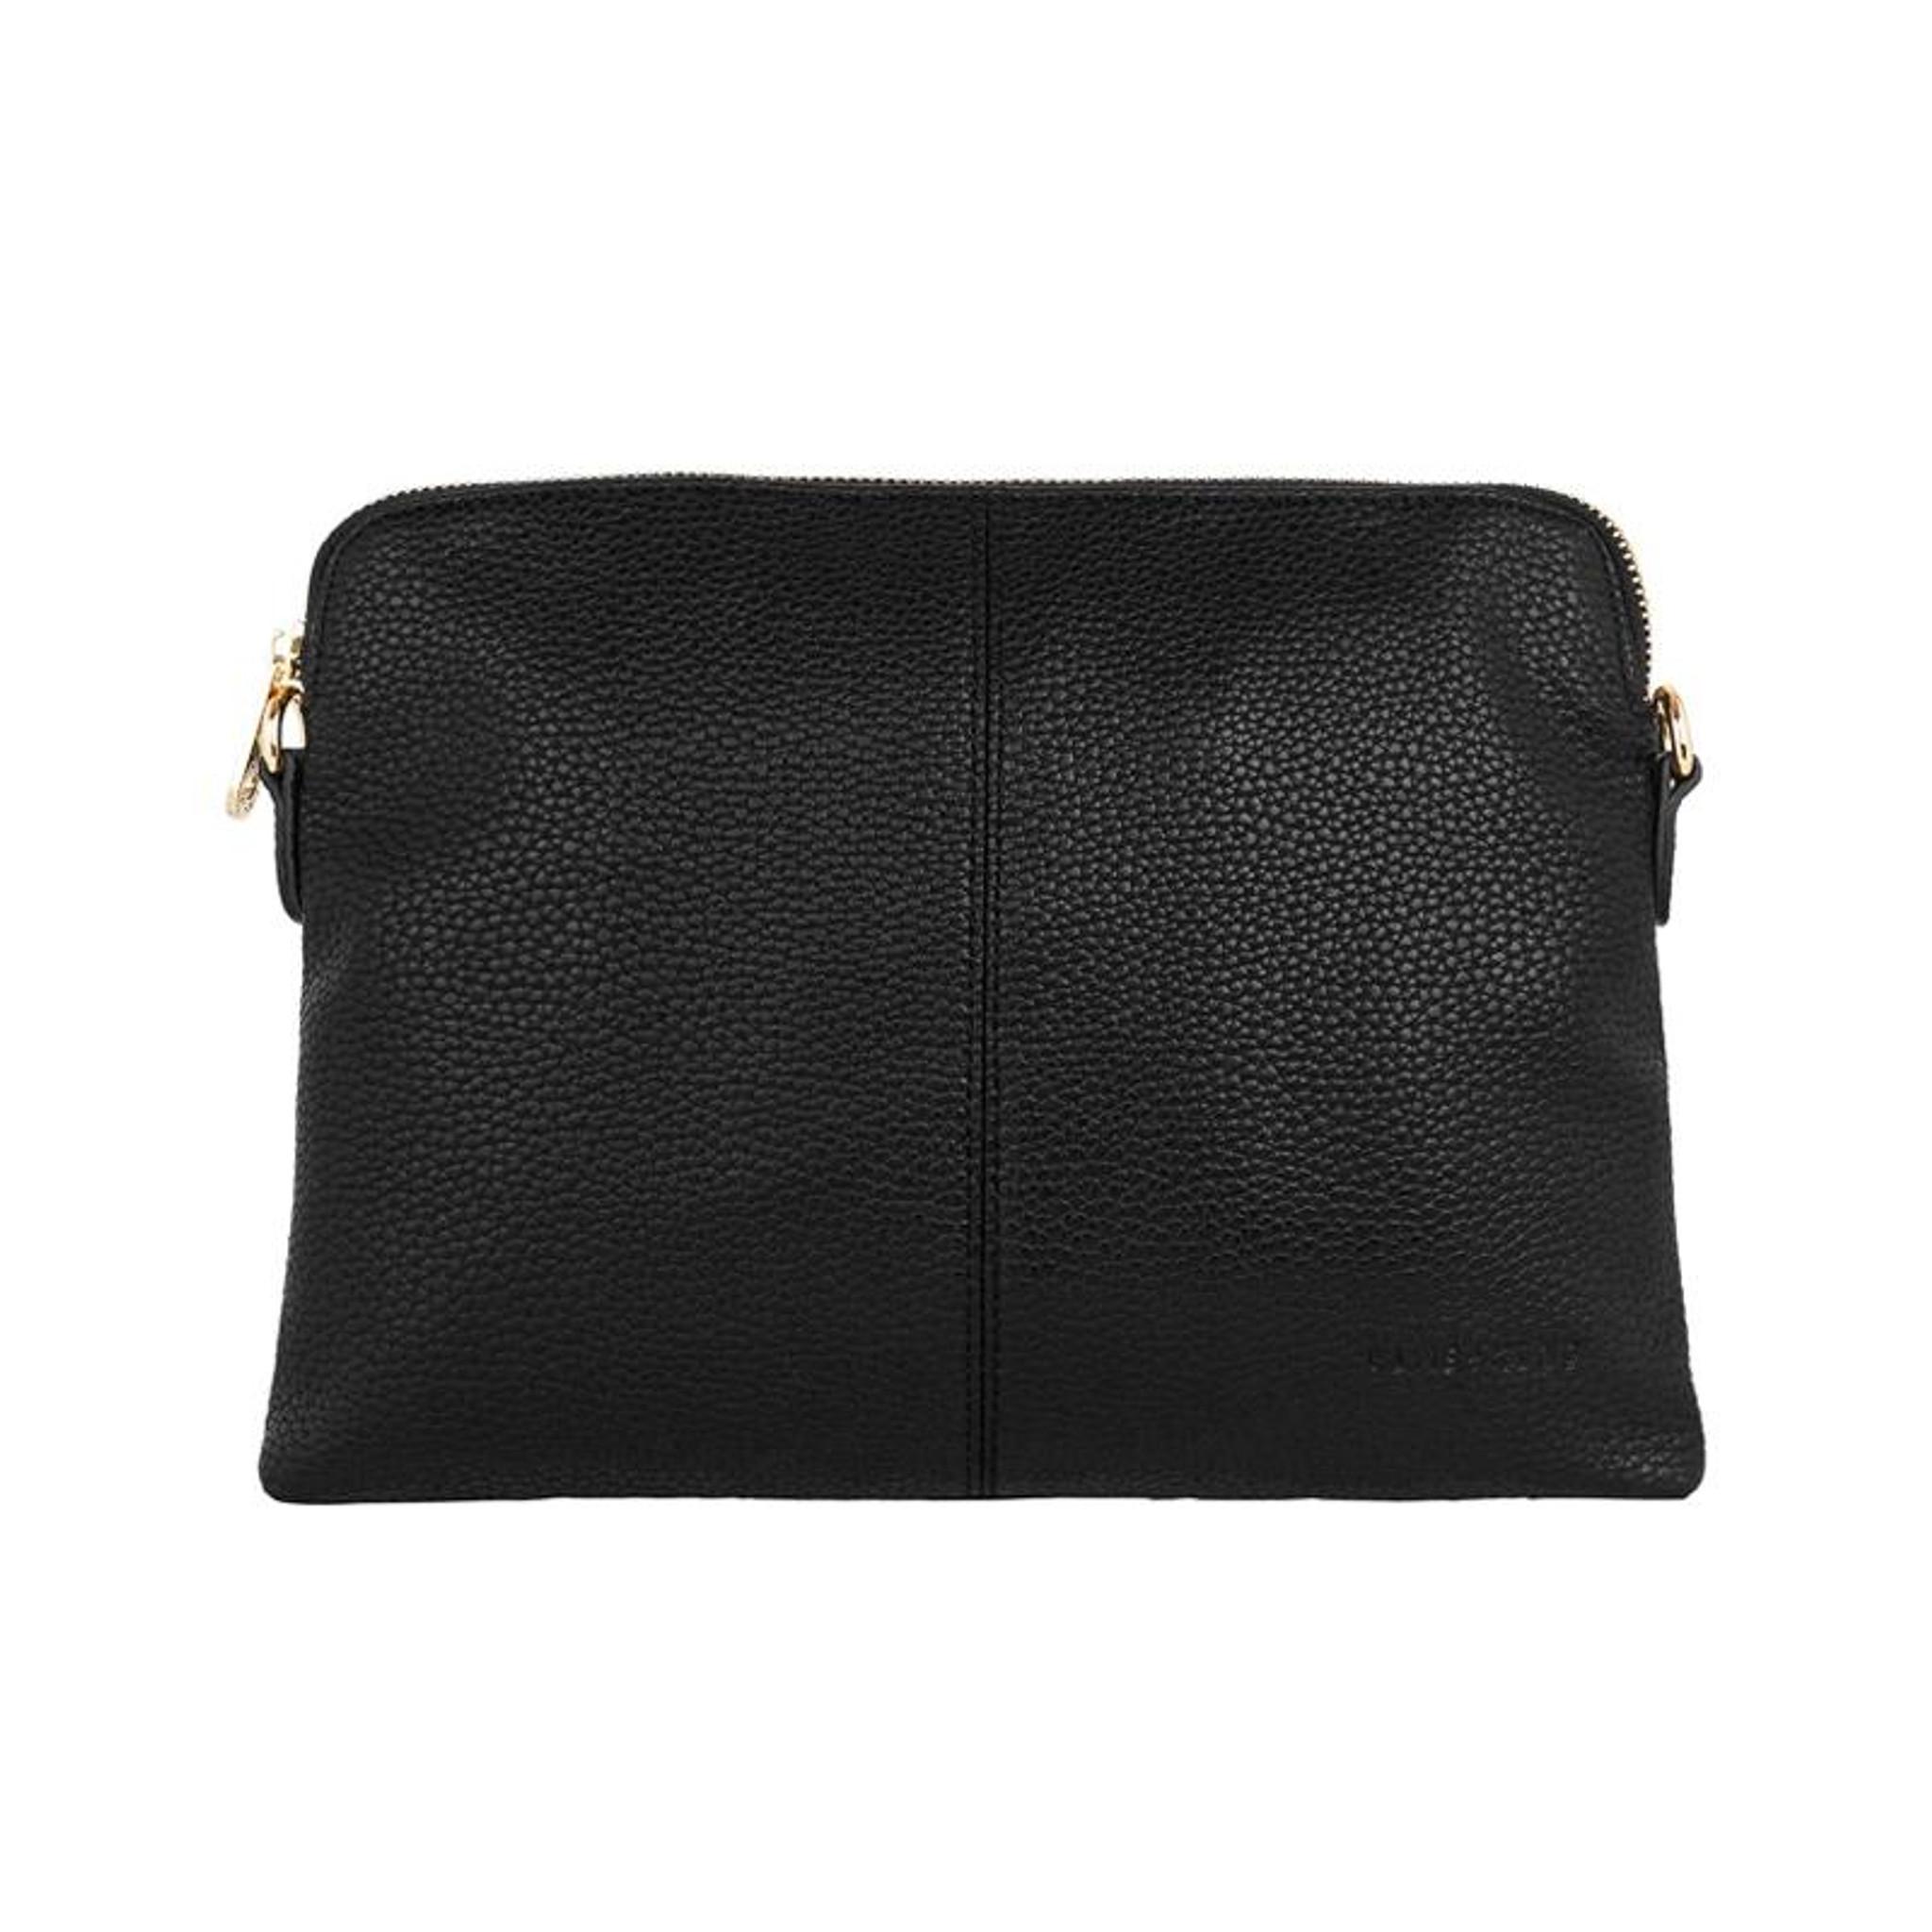 Bowery Wallet by ELMS + KING - Black